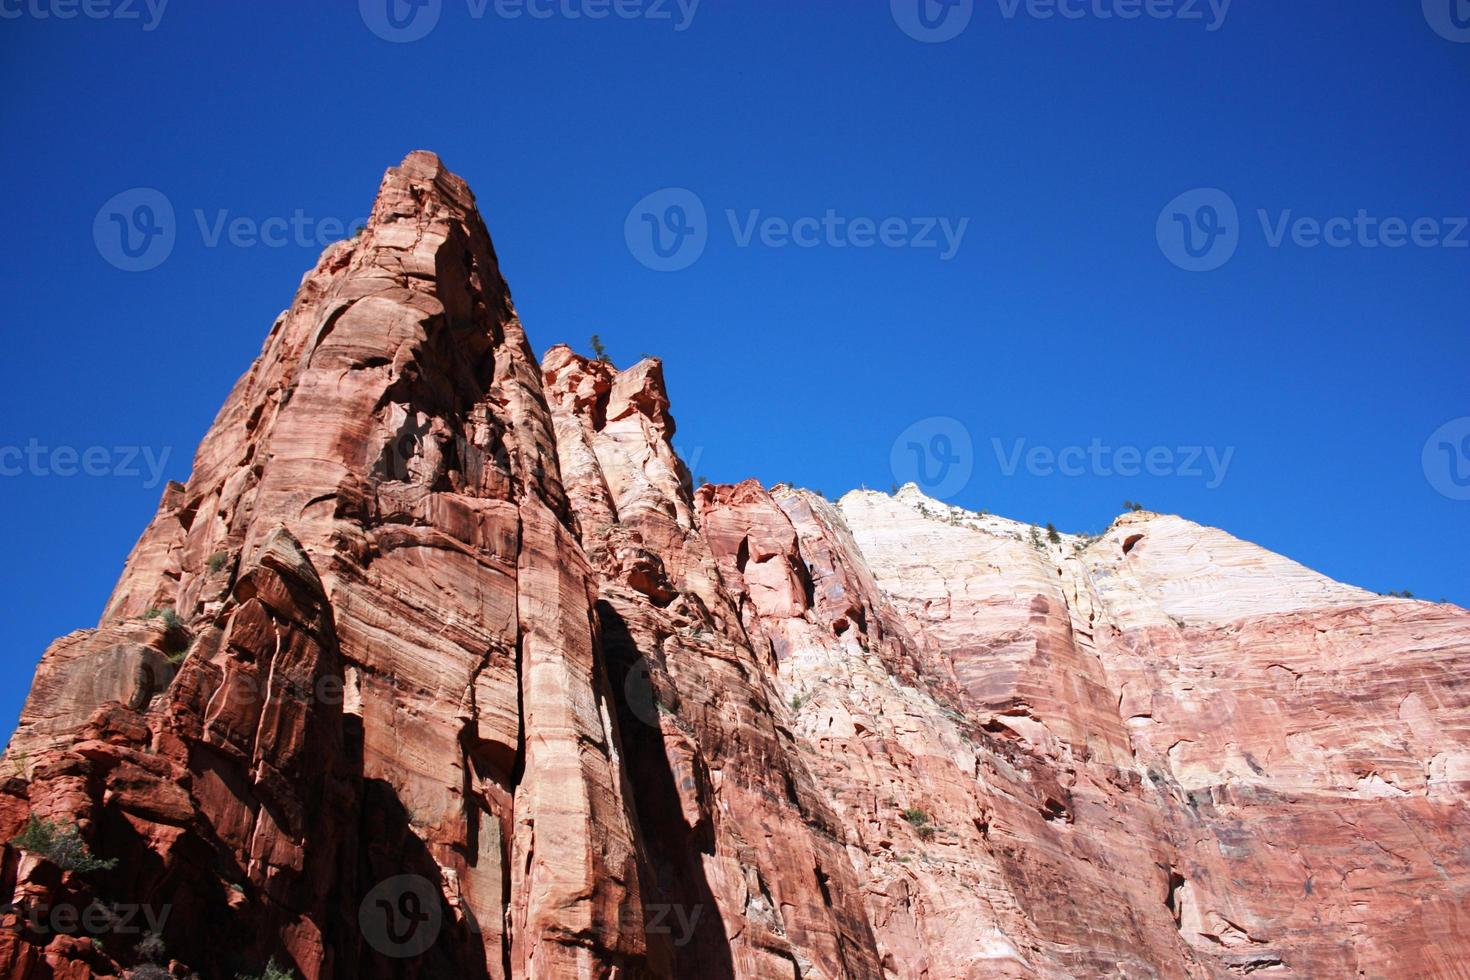 Rote Felsenorgel im Zion-Nationalpark in Utah, USA foto